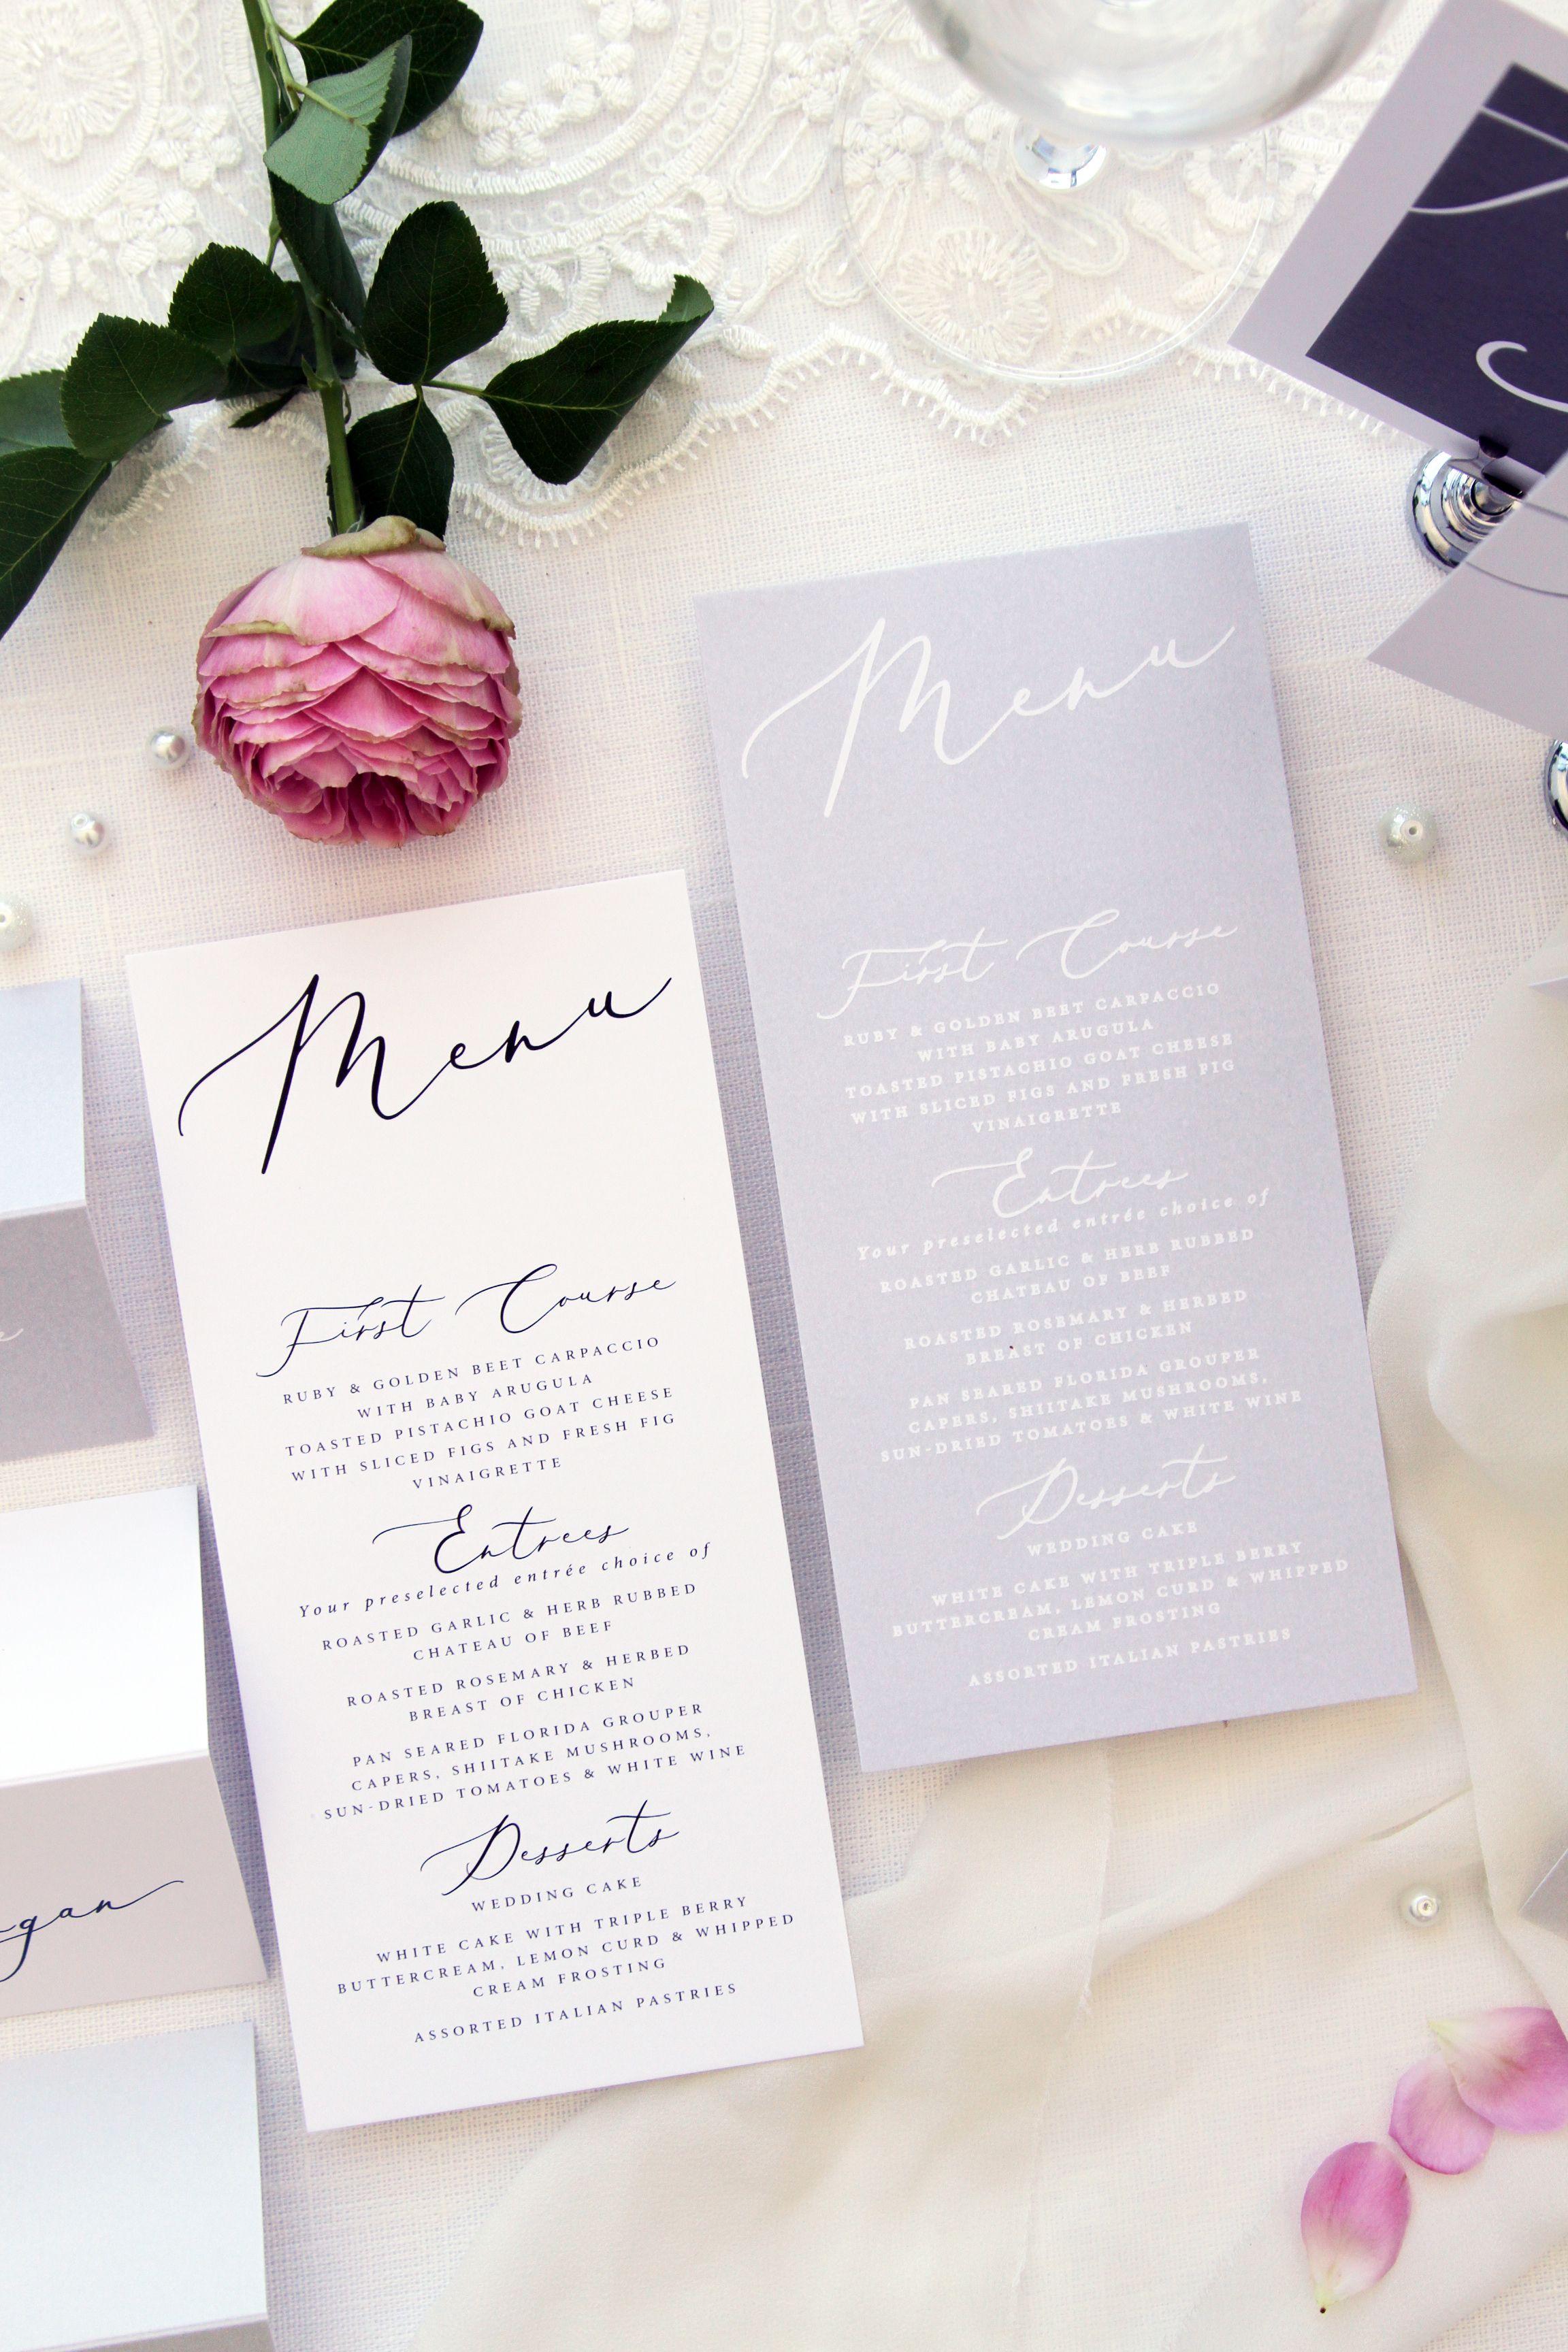 Pin by Paradise for You on Wedding Menus   Pinterest   Wedding menu ...